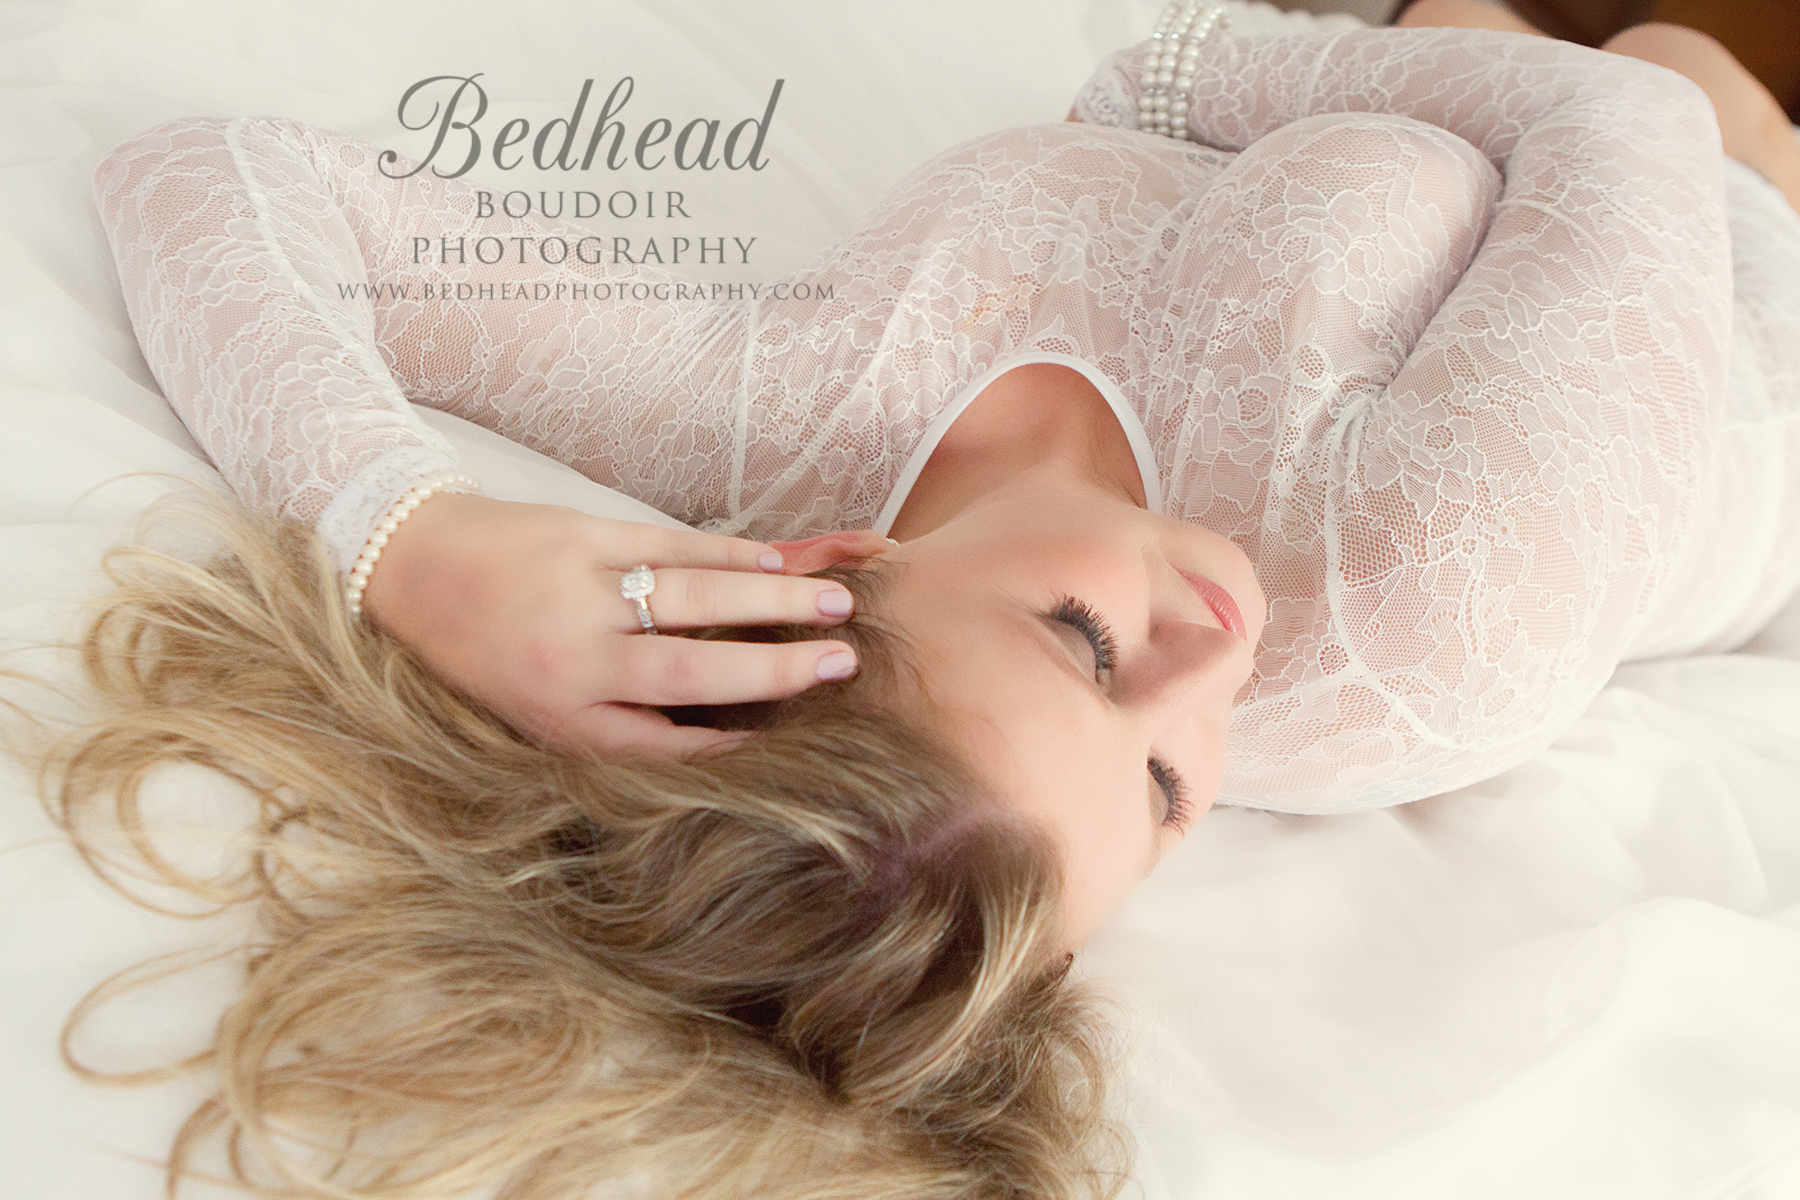 bedhead boudoir photography chicago